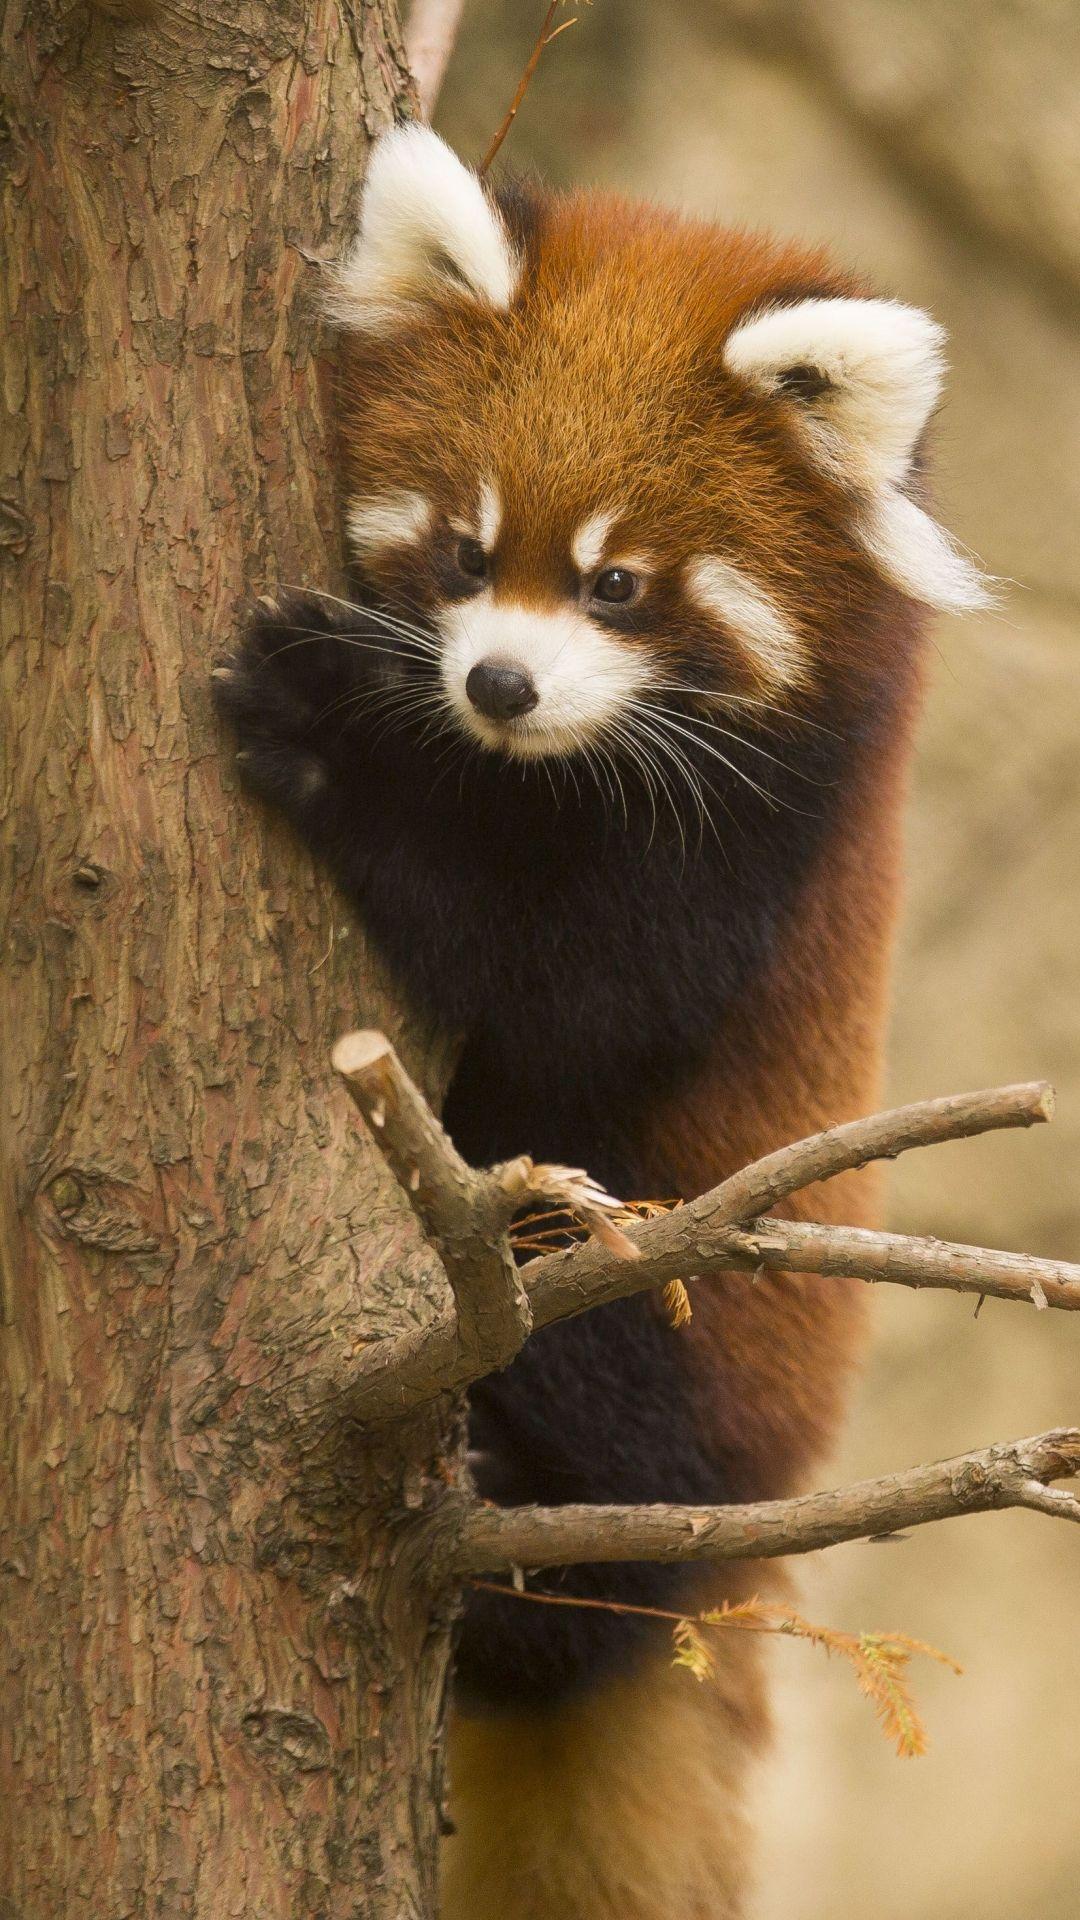 Animal Red Panda Chicago Zoo Mobile Wallpaper Red Panda Red Panda Cute Panda Wallpapers